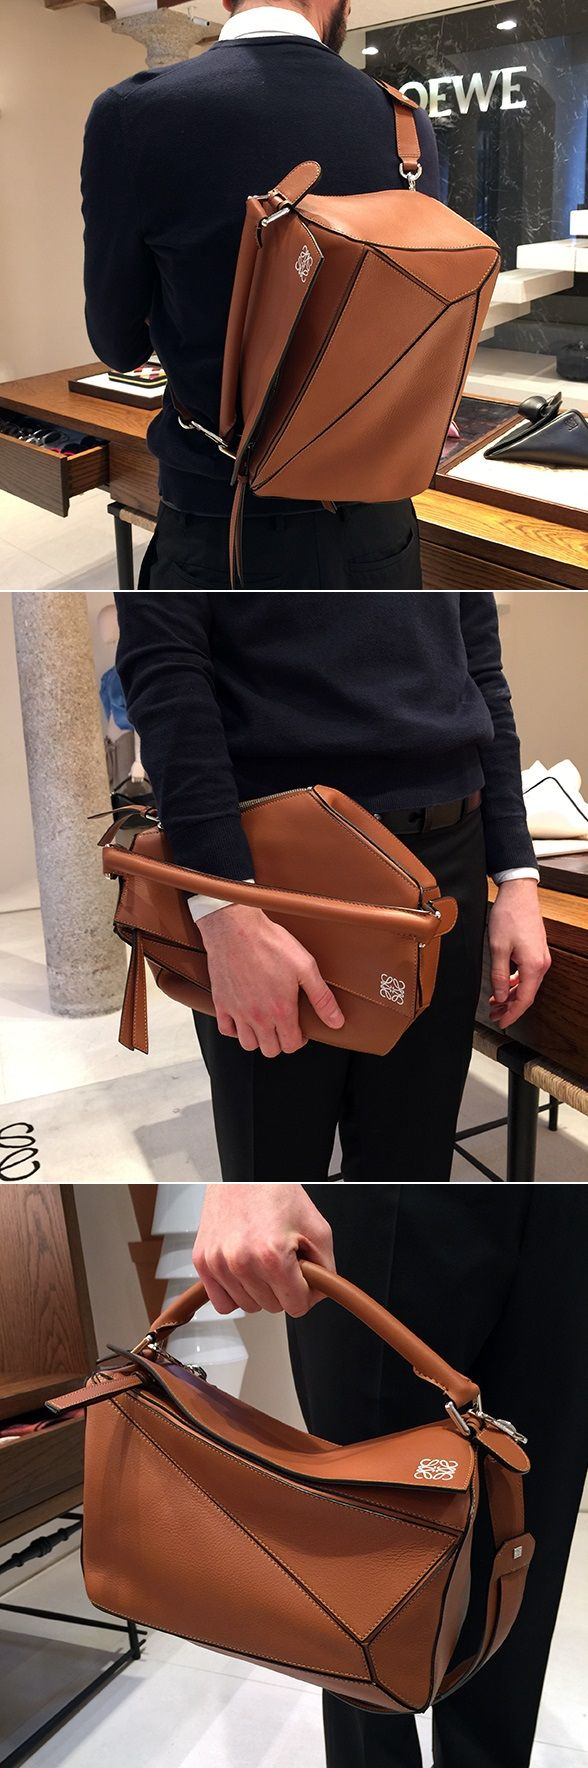 #Loewe puzzle bag  #accesorios